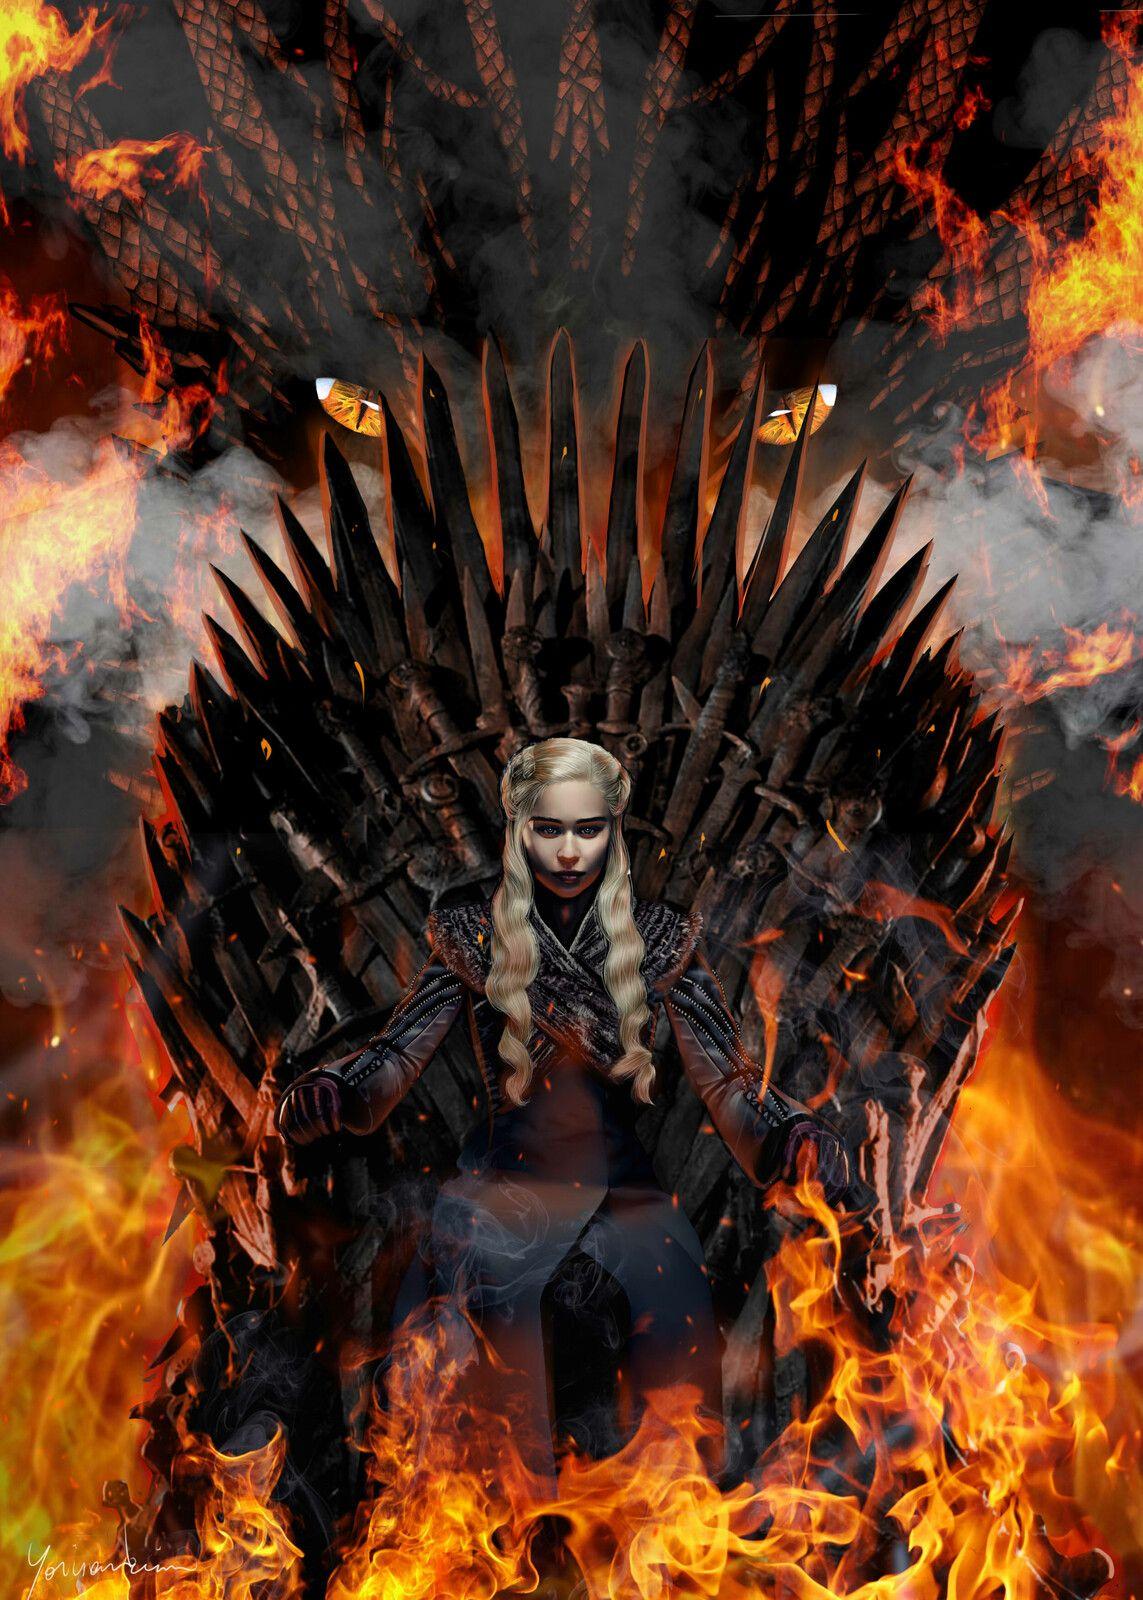 Game of thrones Daenerys Targaryen, Kim Franck